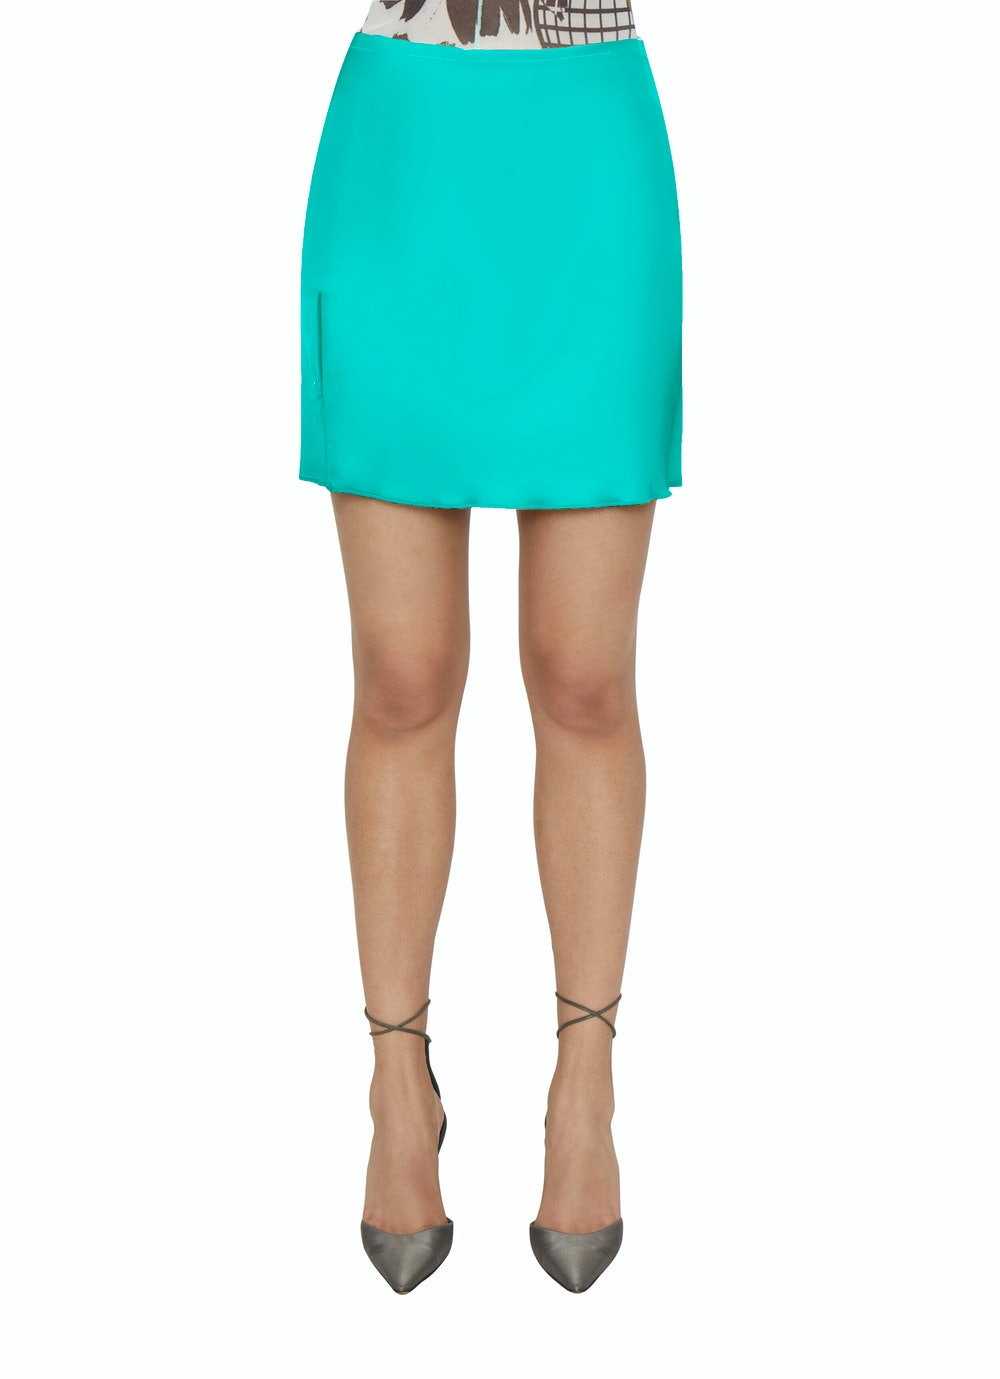 Satin Slit Miniskirt